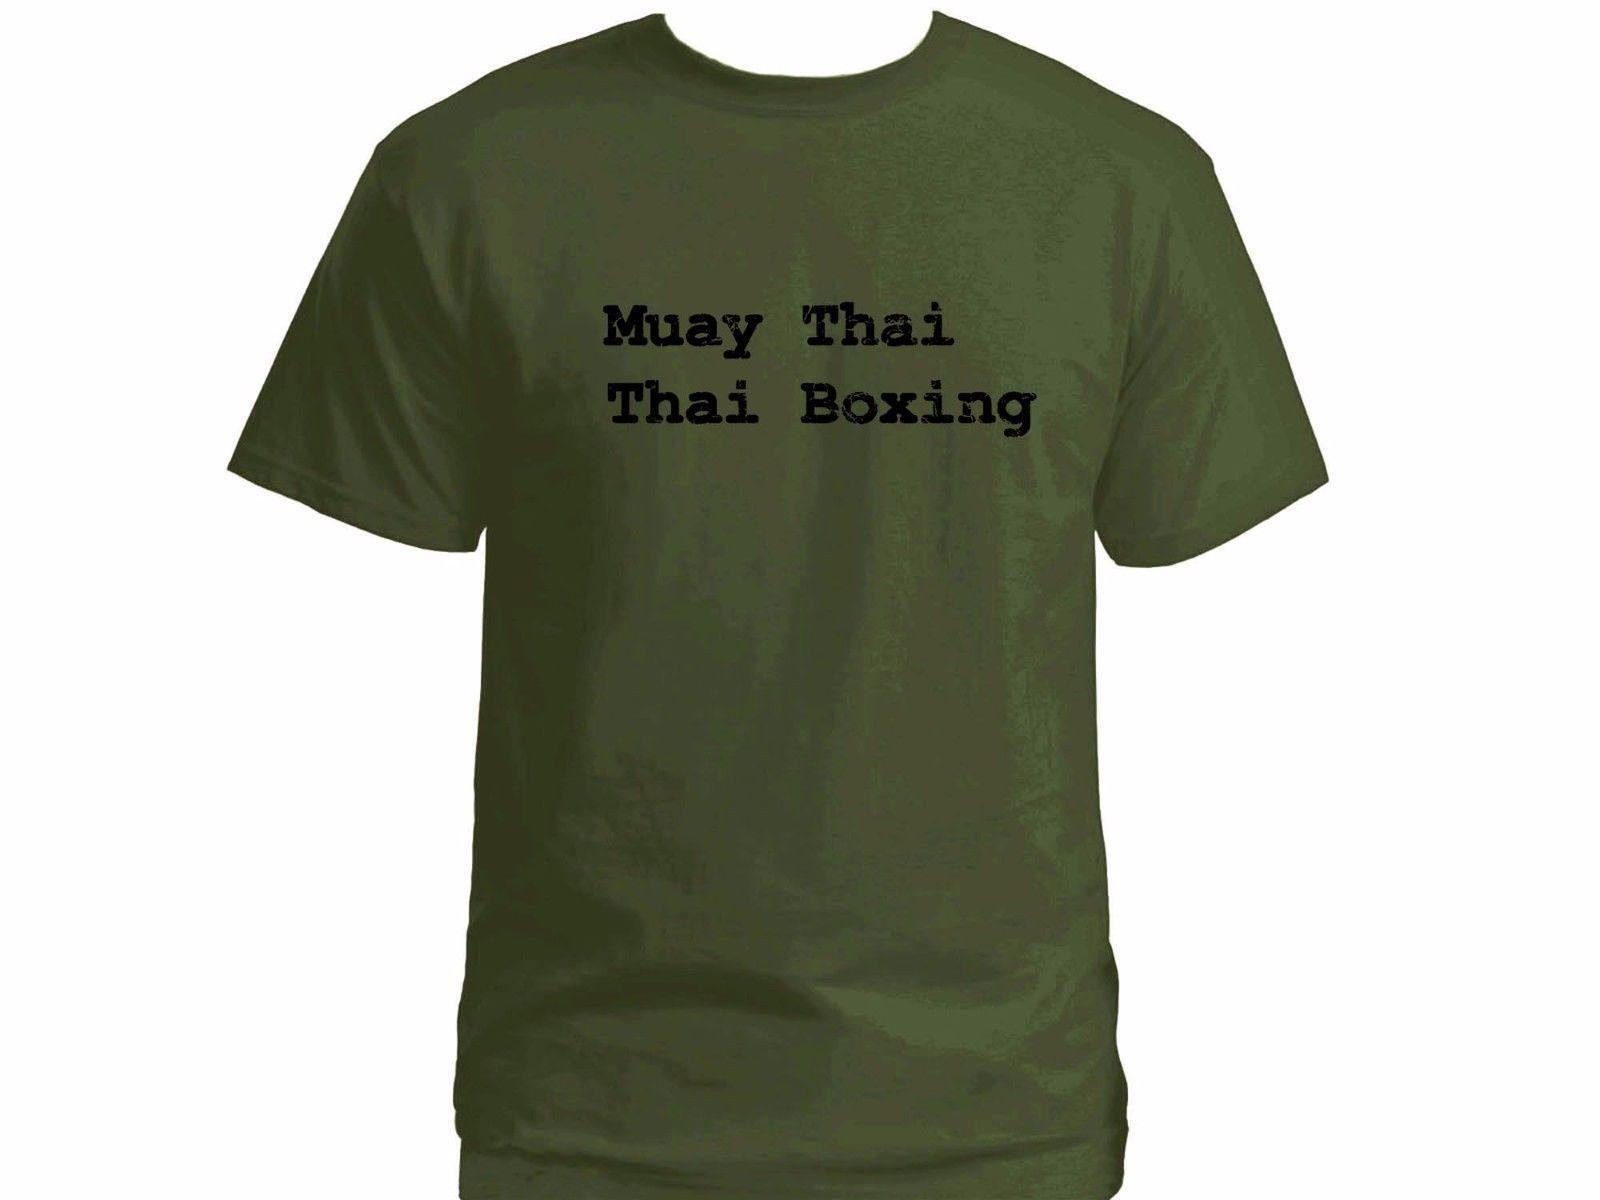 Muay Thai kung fu Distressed Print Kickboxing Olive Green T-shirt